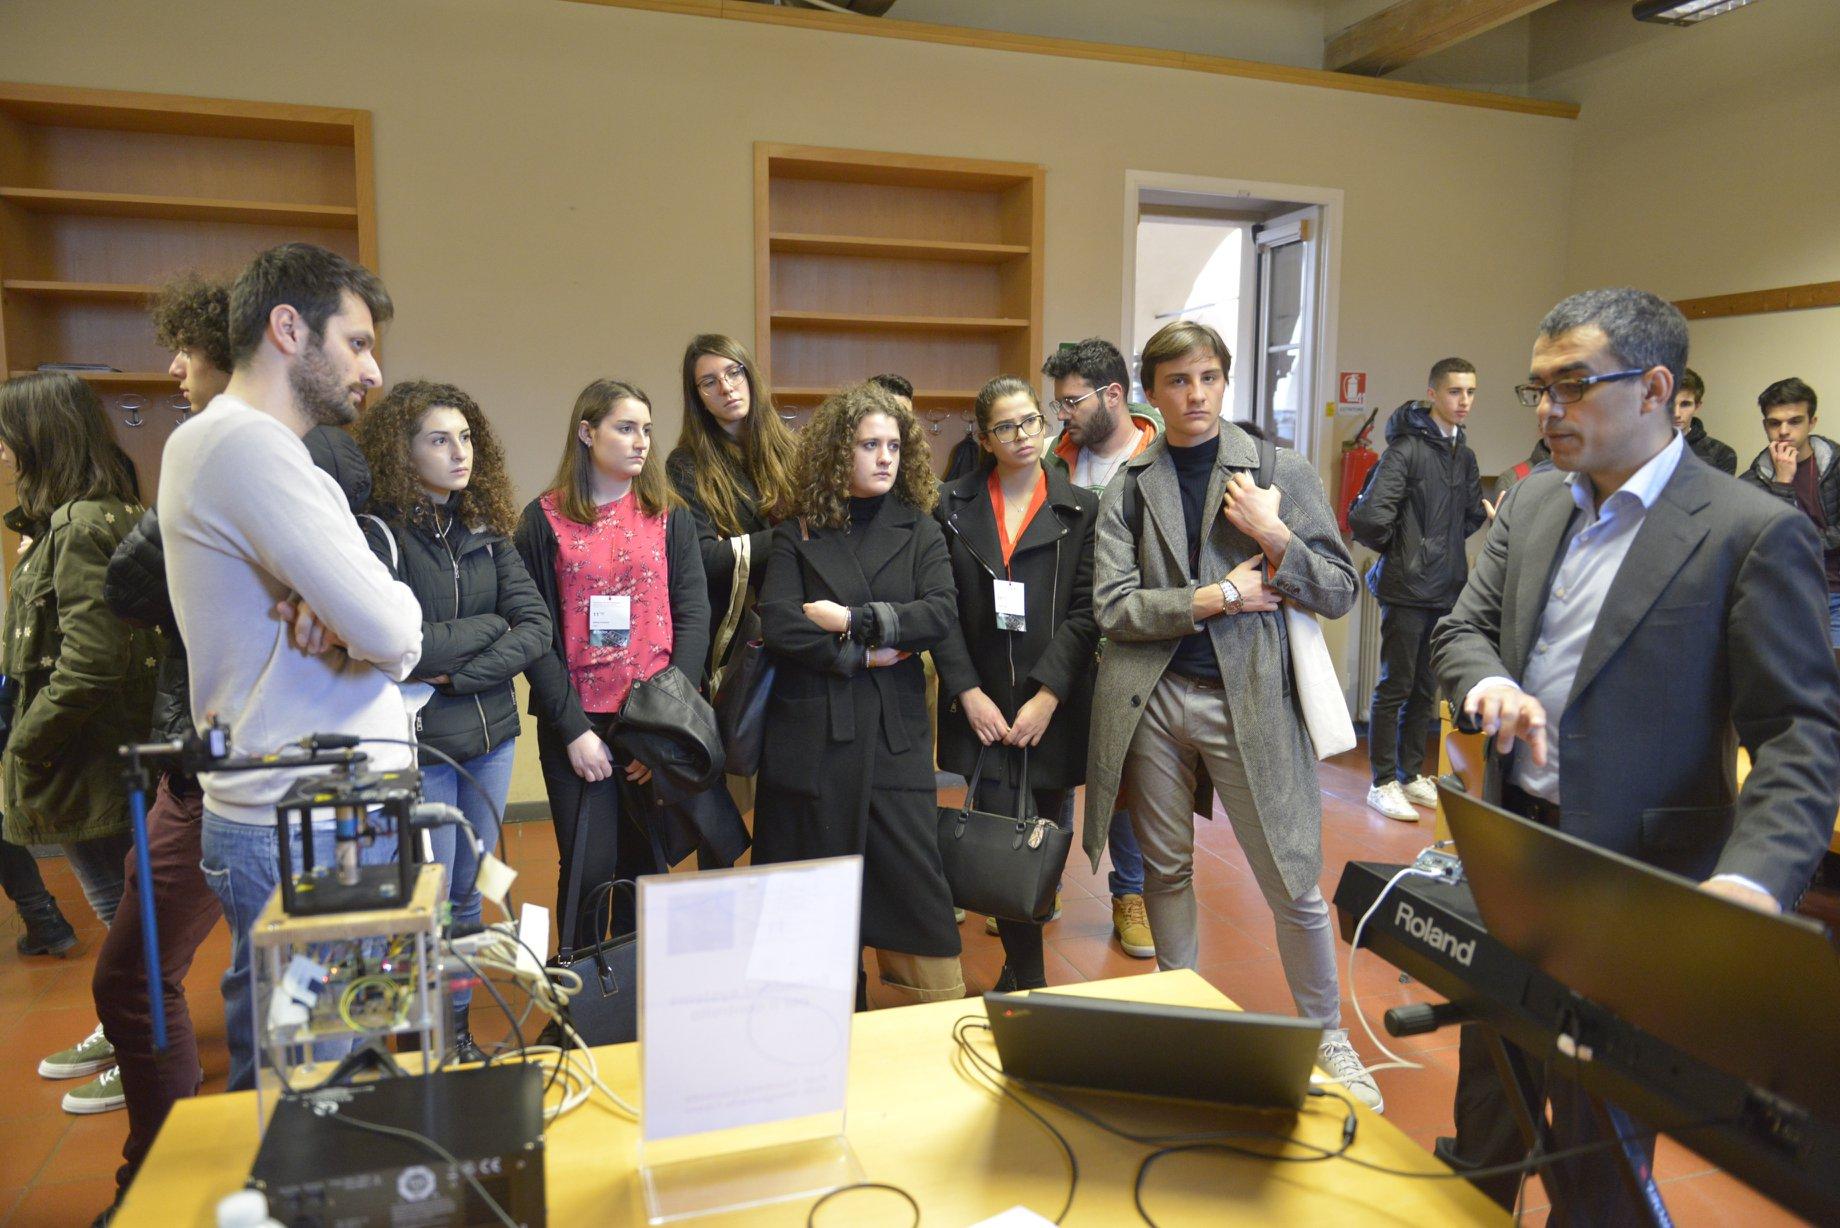 Orientation Day at the Scuola Sant'Anna